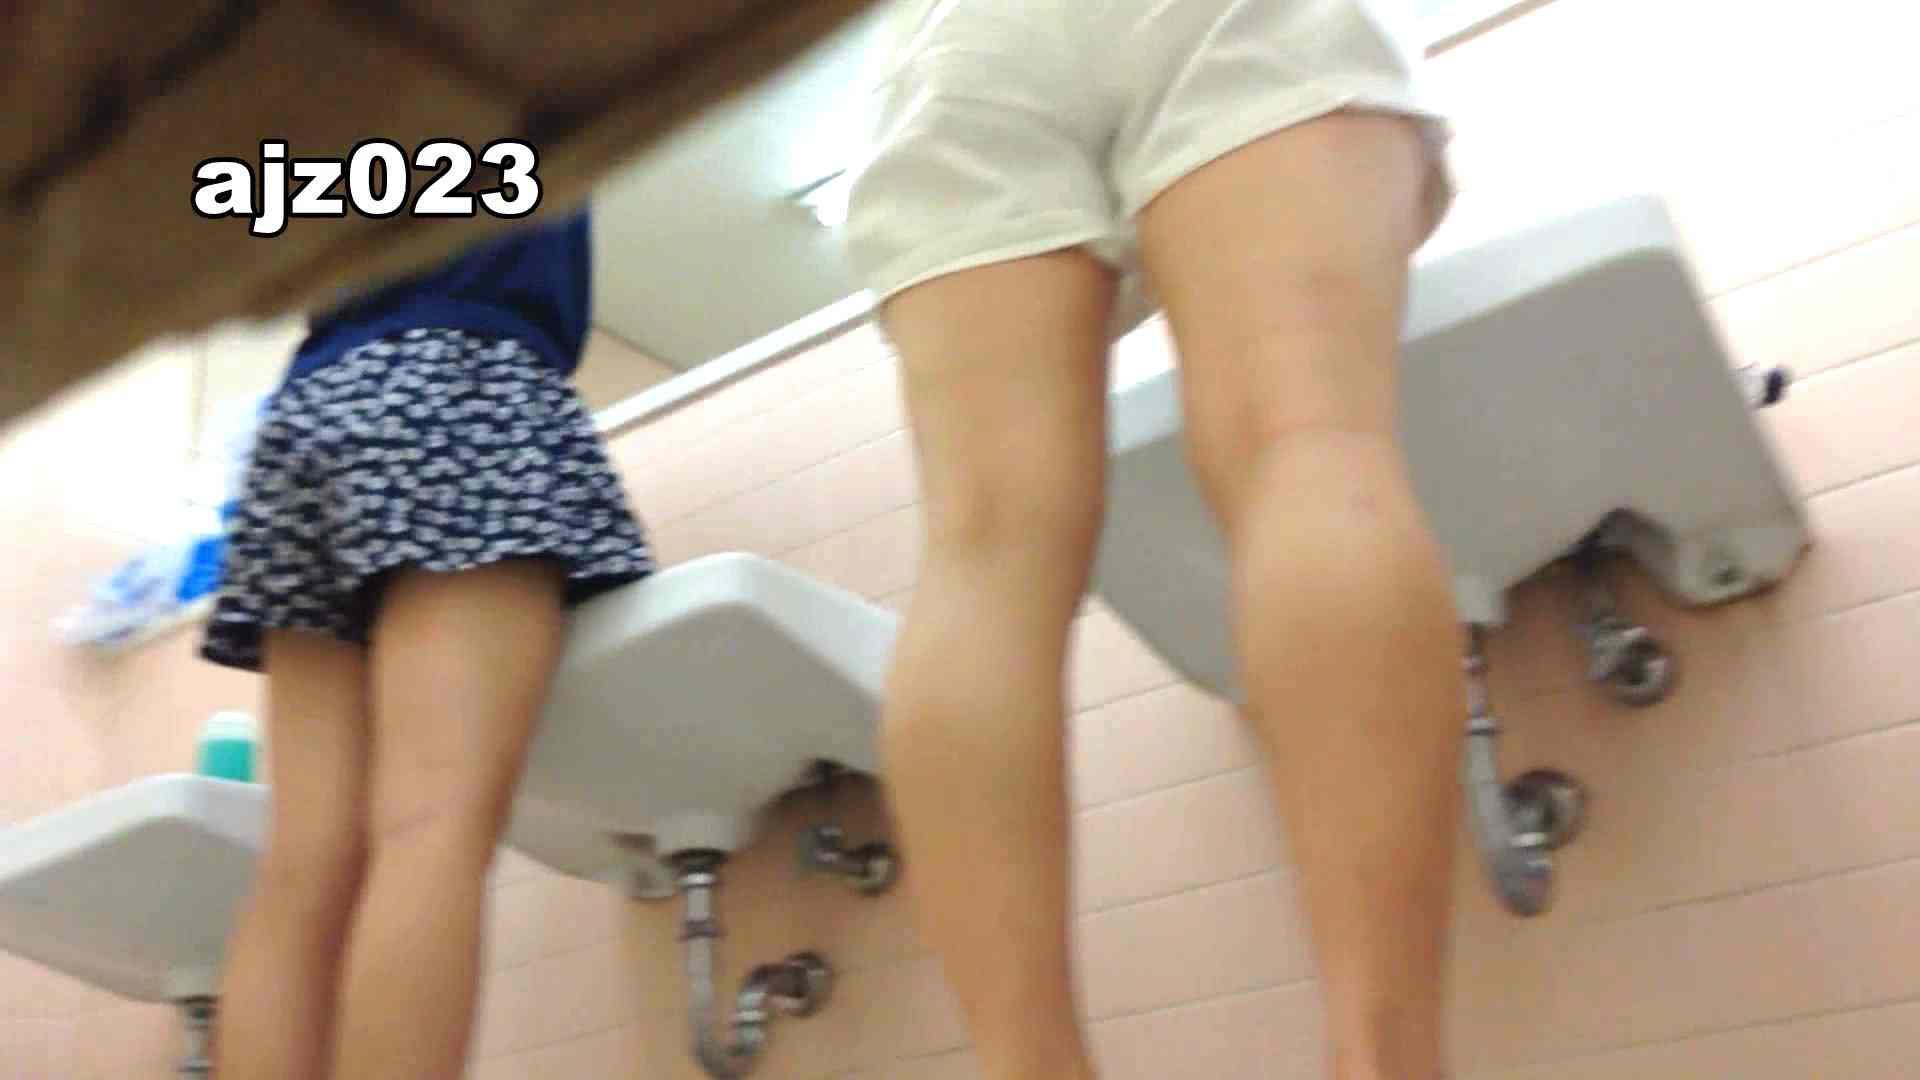 某有名大学女性洗面所 vol.23 洗面所 隠し撮りオマンコ動画紹介 101画像 51